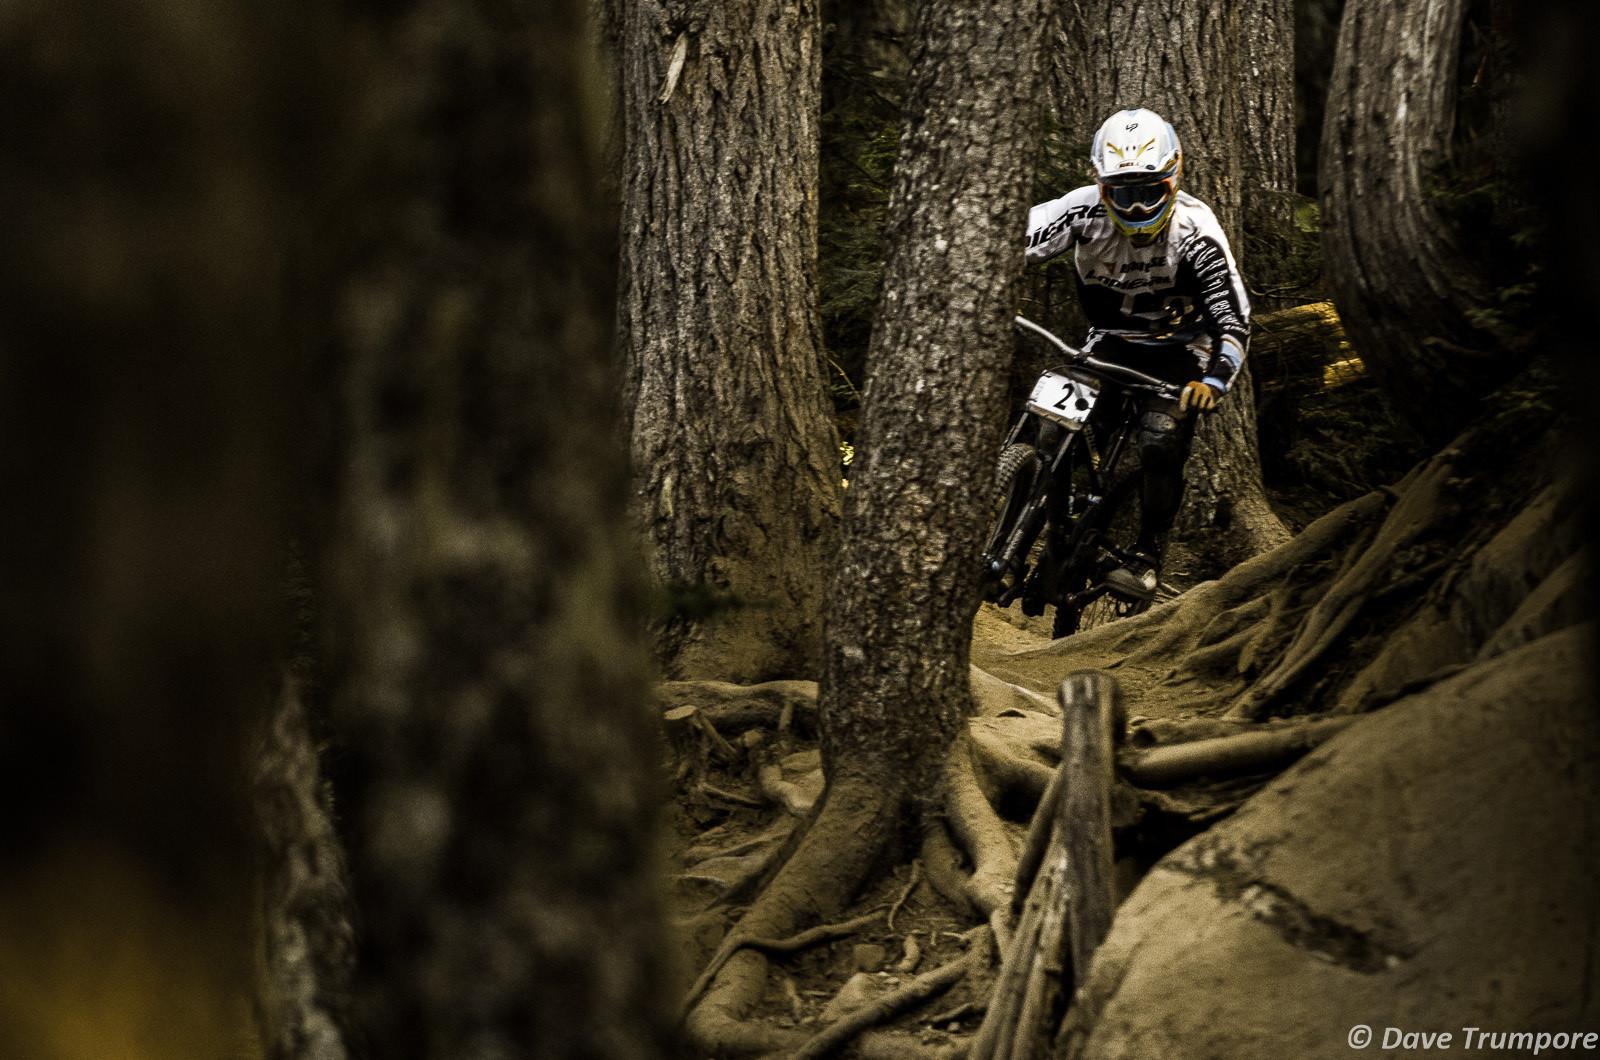 Loic Bruni at Crankworx Garbanzo DH - Crankworx Whistler Garbanzo DH - Mountain Biking Pictures - Vital MTB